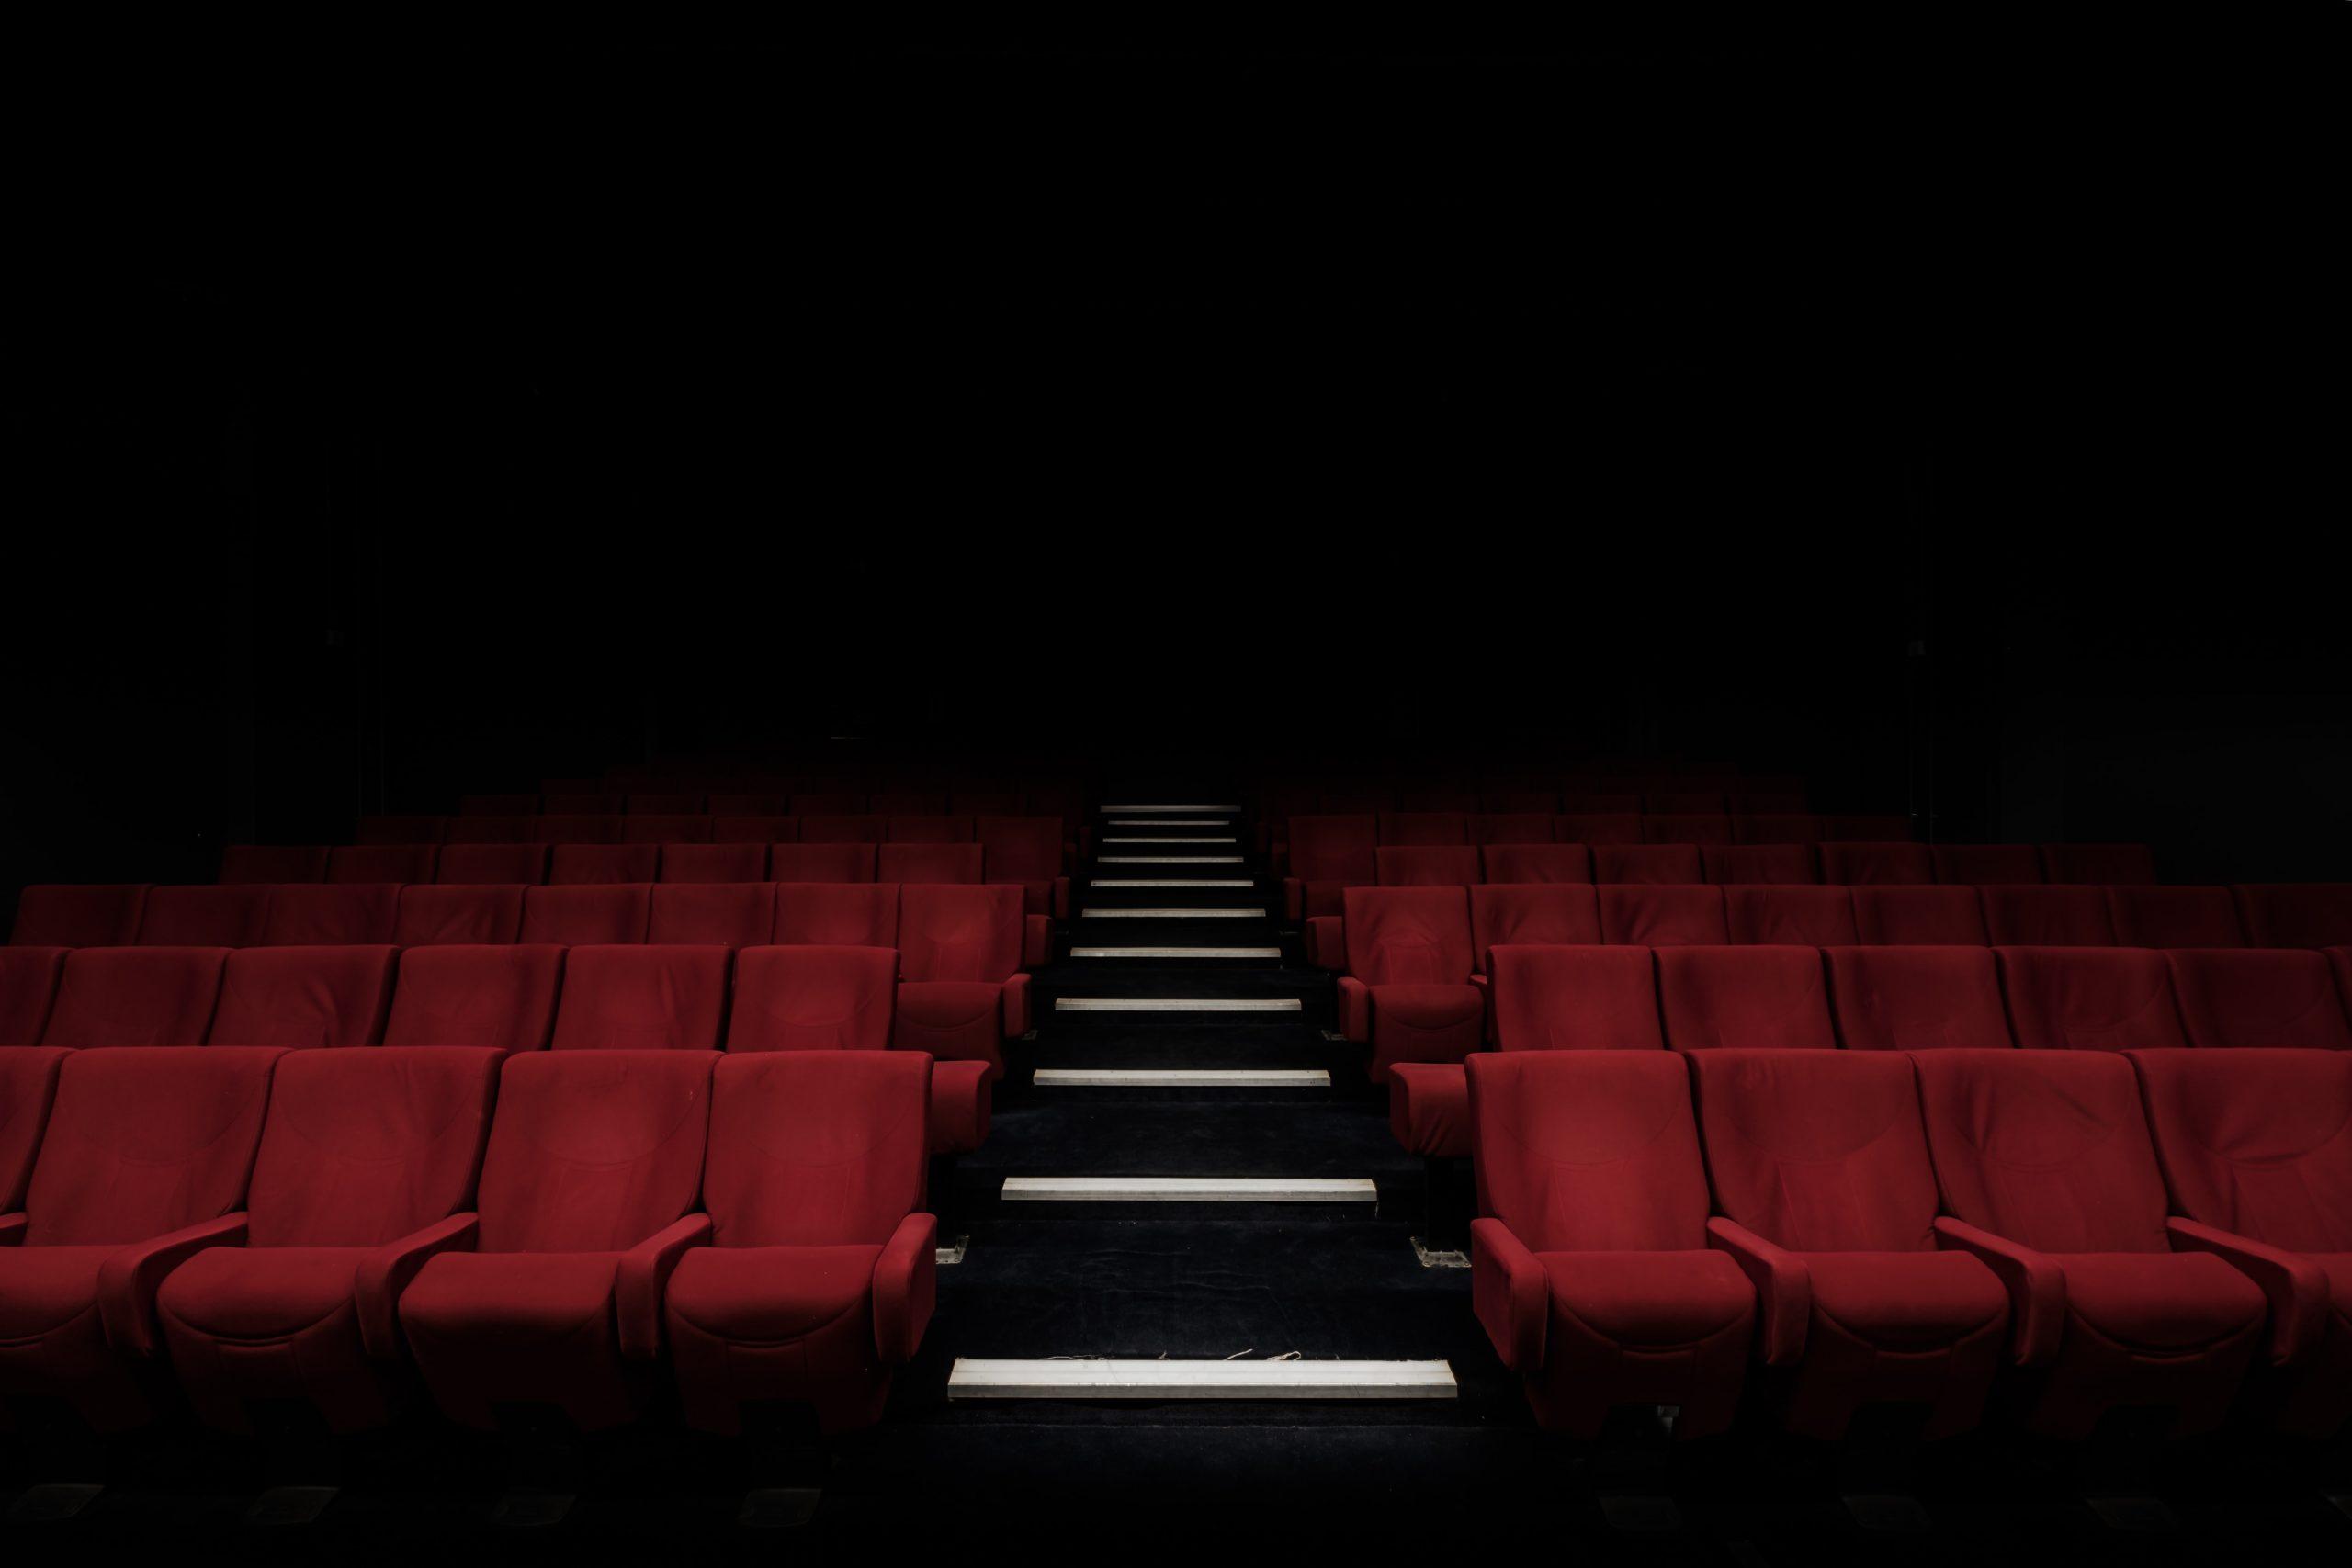 salle-cinema-spectacle-vide